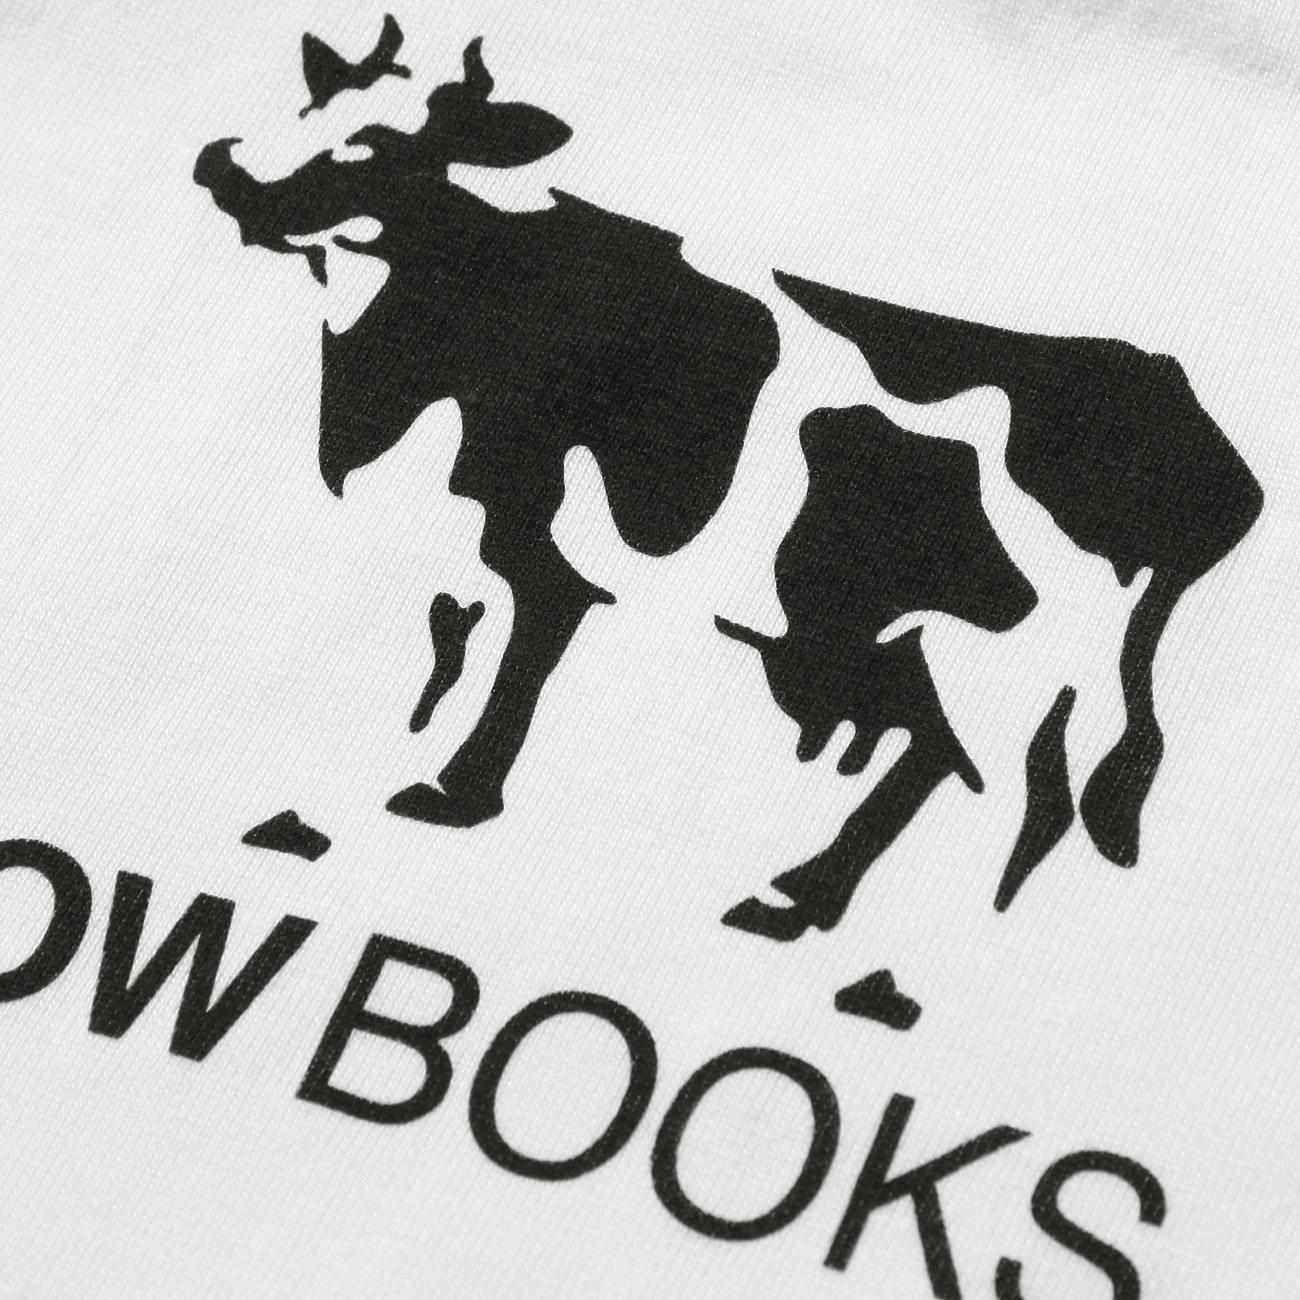 cow books カウブックス kids tshirt white black 通販 正規